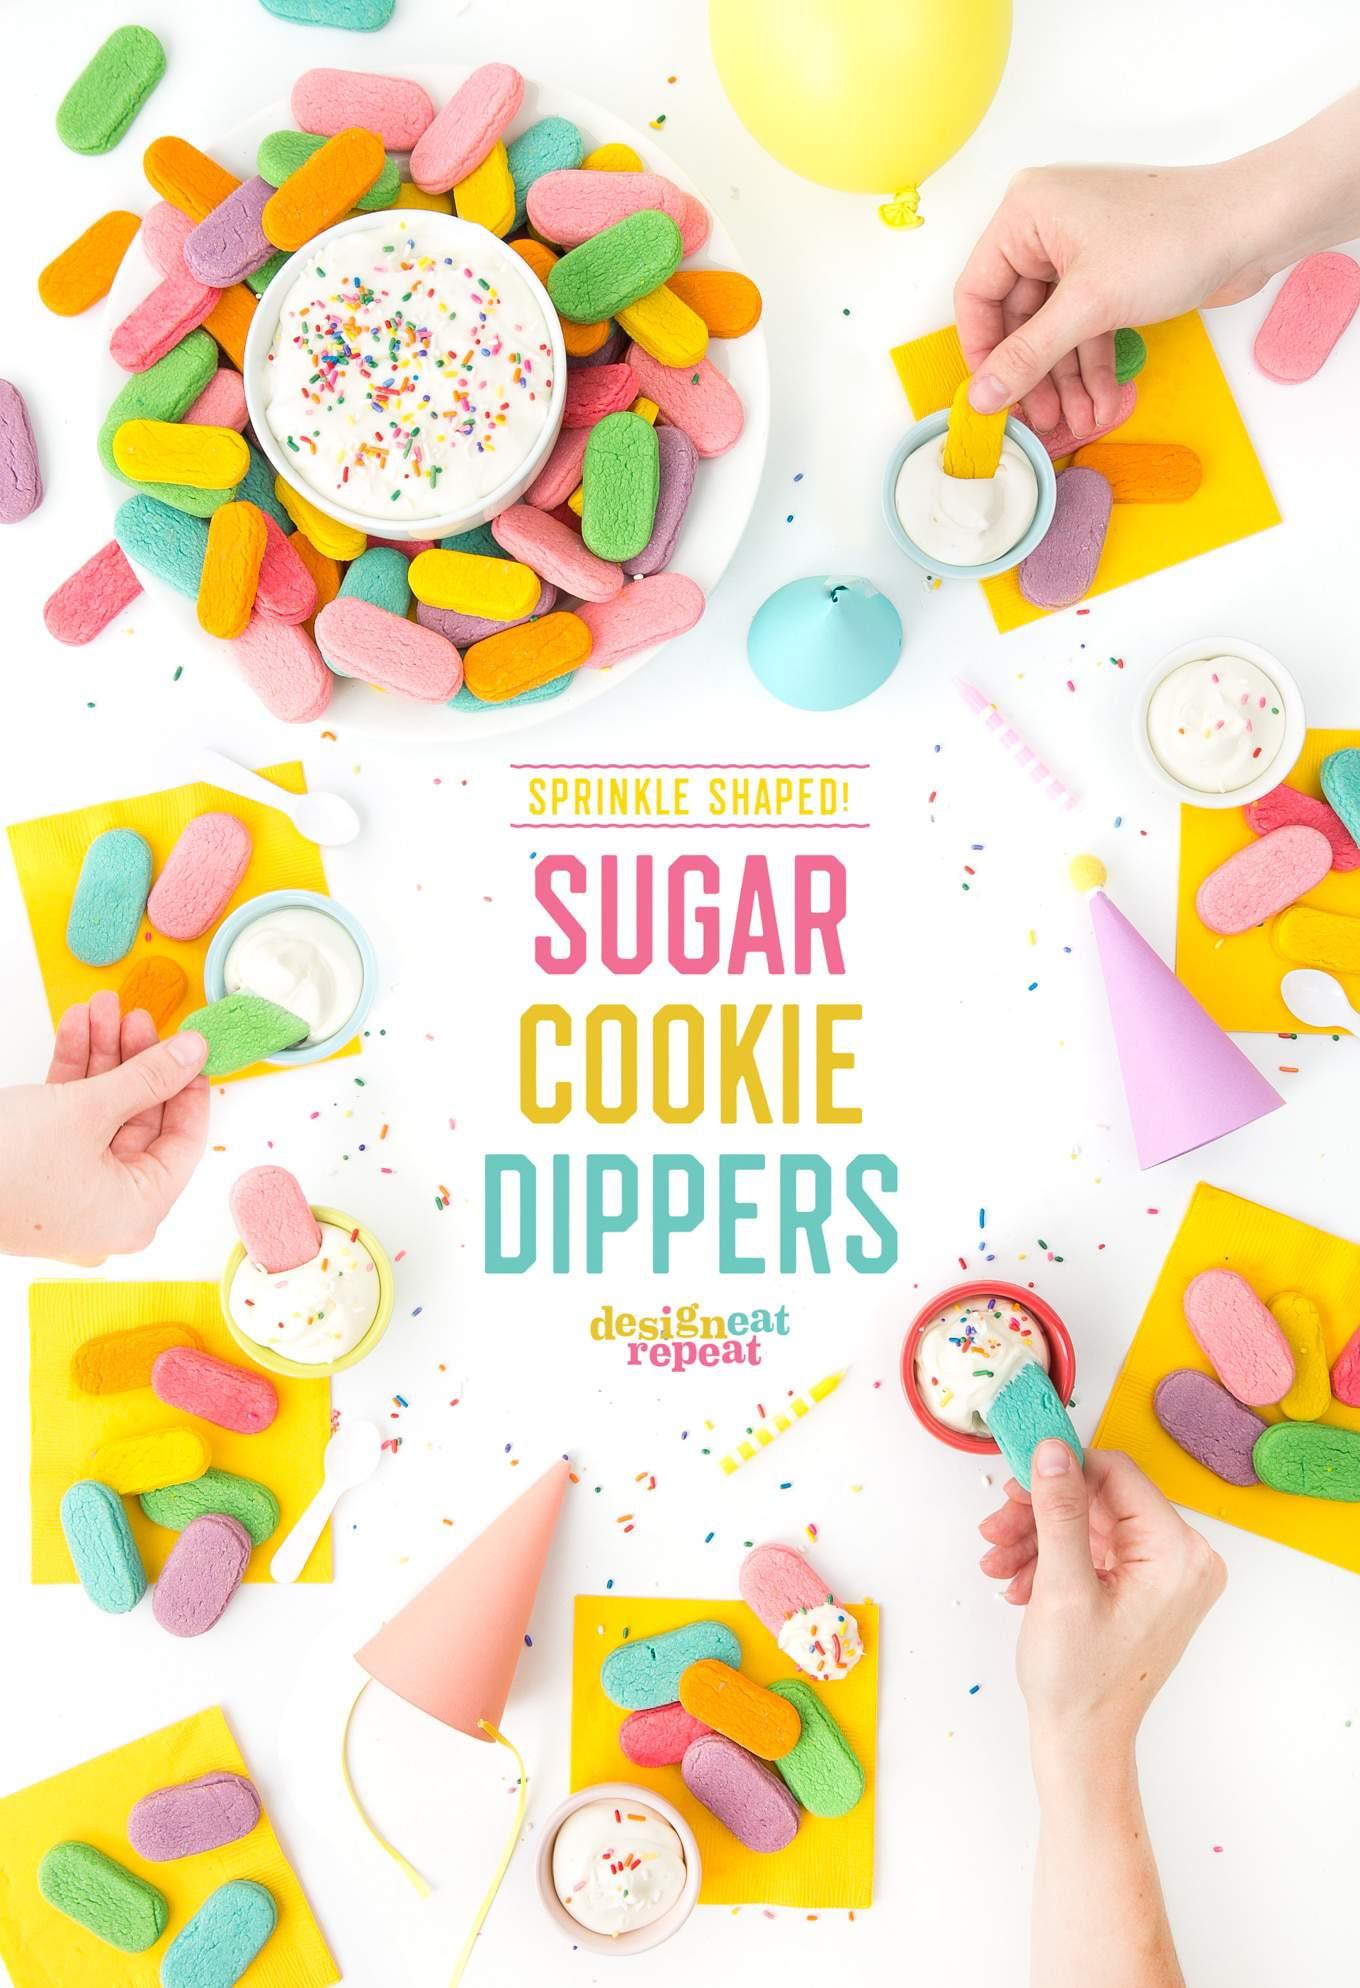 OMG. Sugar cookies shaped like SPRINKLES! Make these sugar cookie dippers as the perfect birthday party treat!   www.DesignEatRepeat.com   #sprinkles #sugarcookie